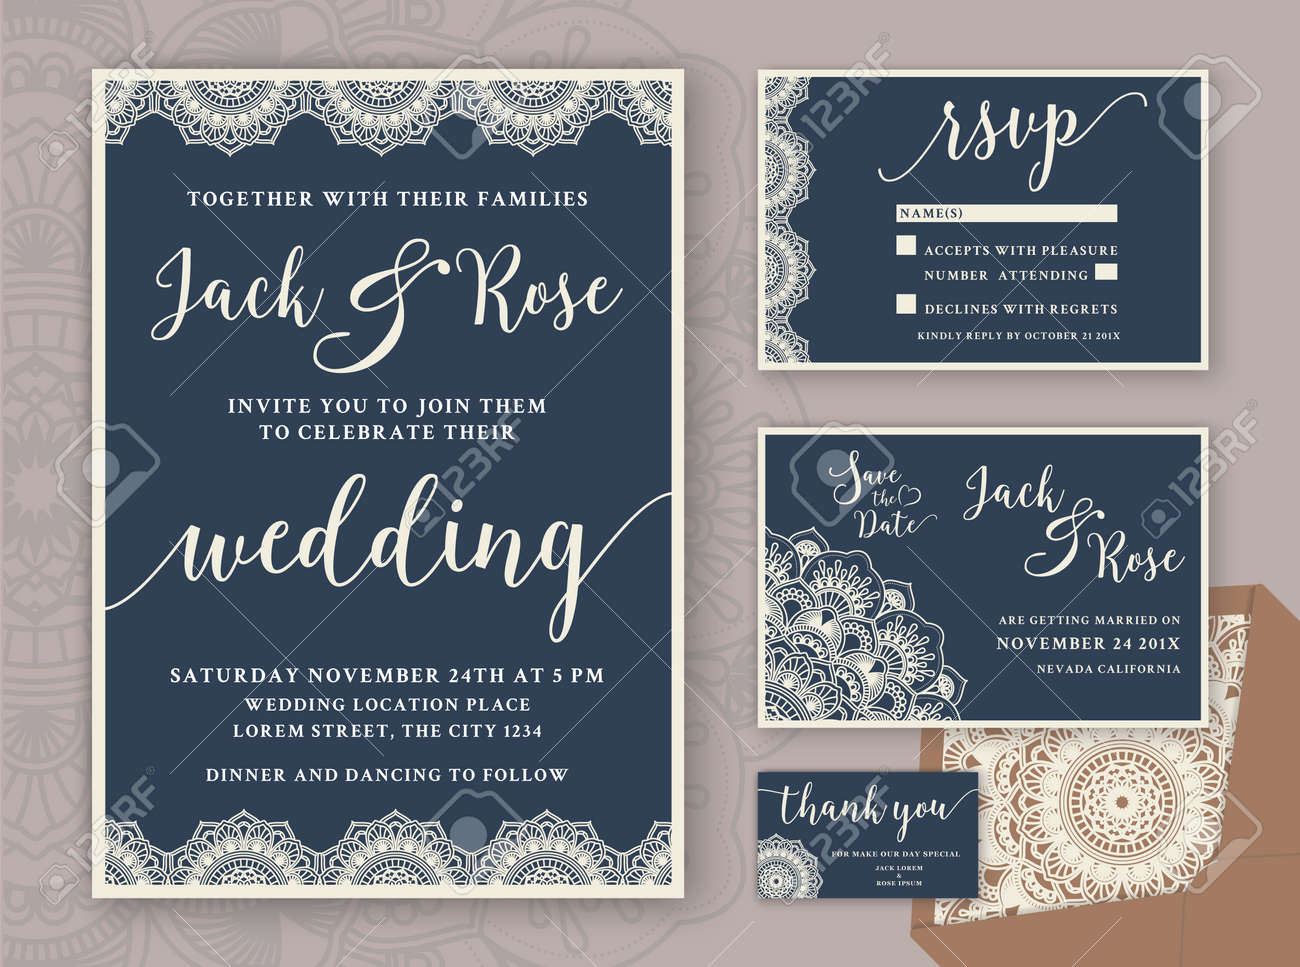 Rustic wedding invitation design template include rsvp card rustic wedding invitation design template include rsvp card save the date card thank stopboris Gallery